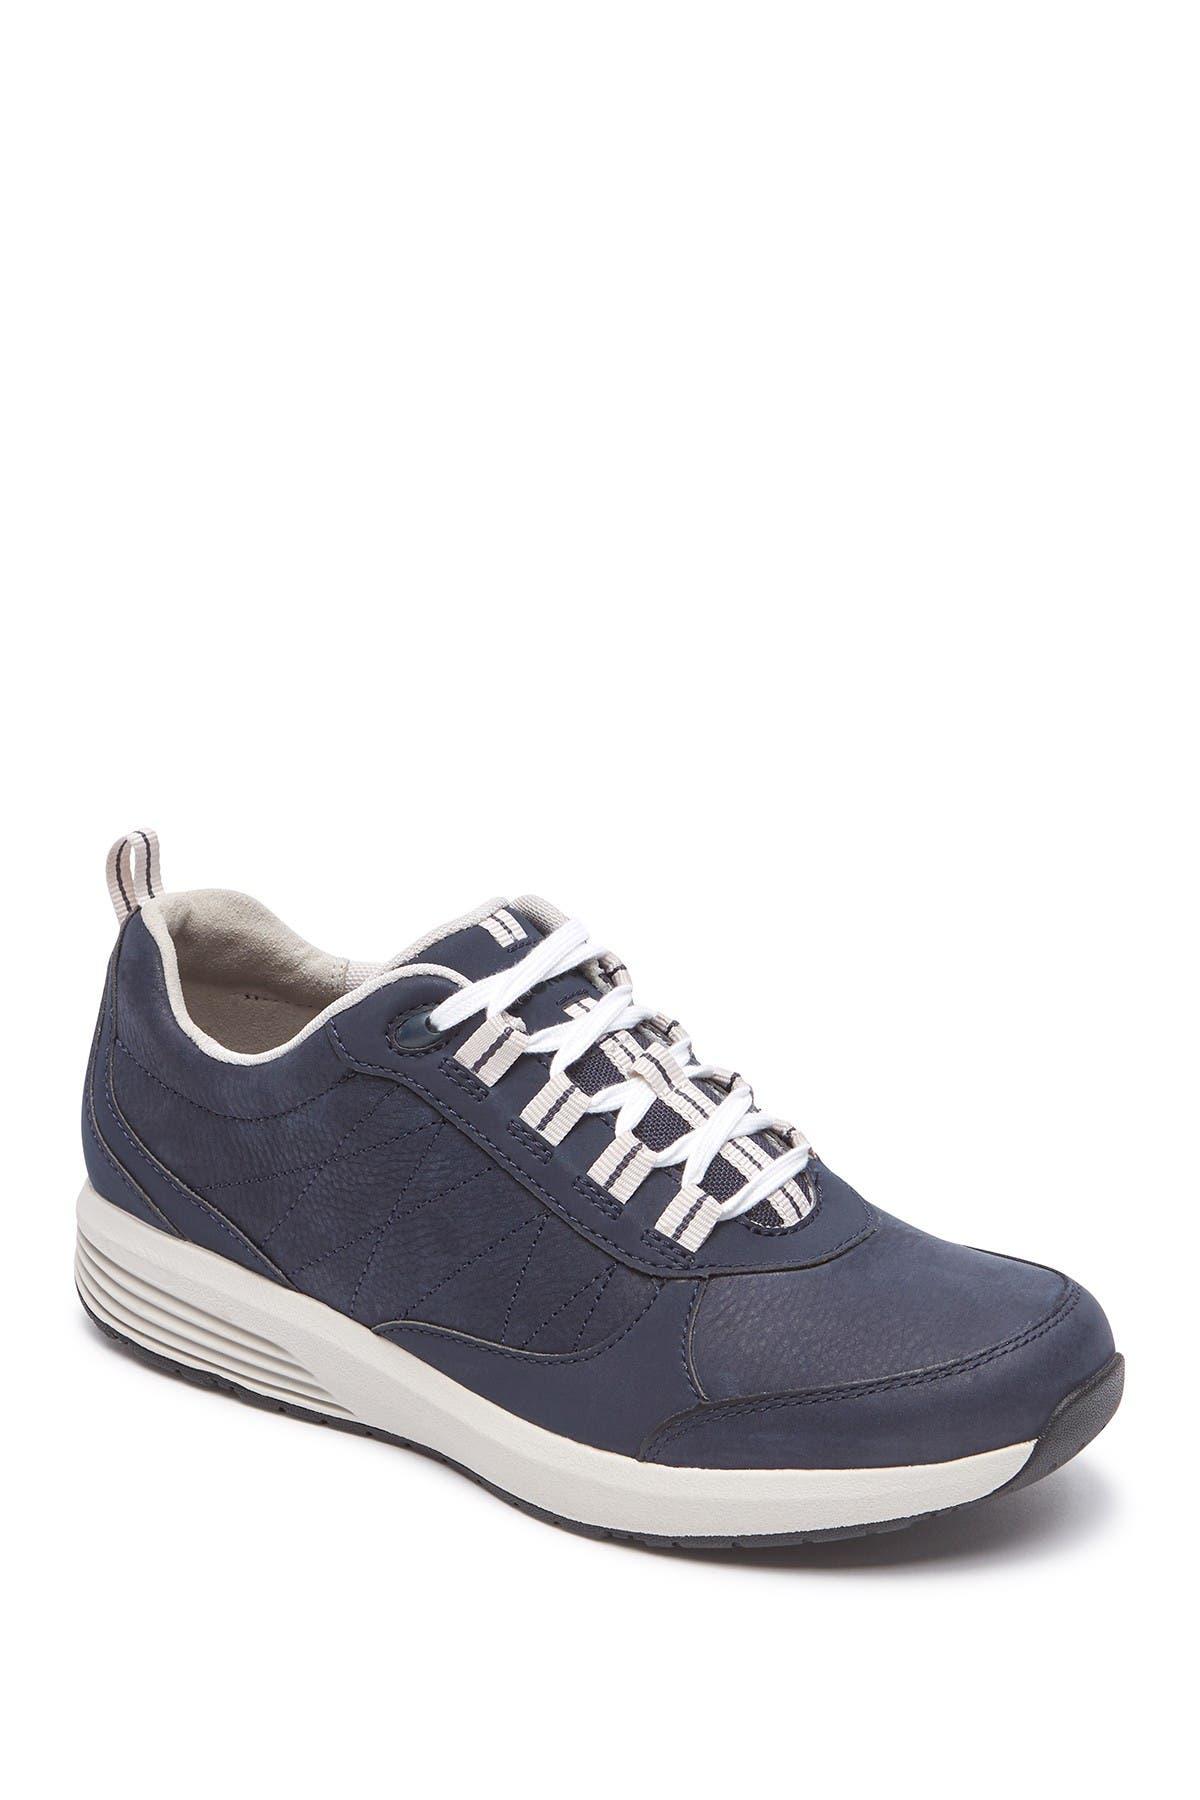 Image of Rockport Trustride Sneaker